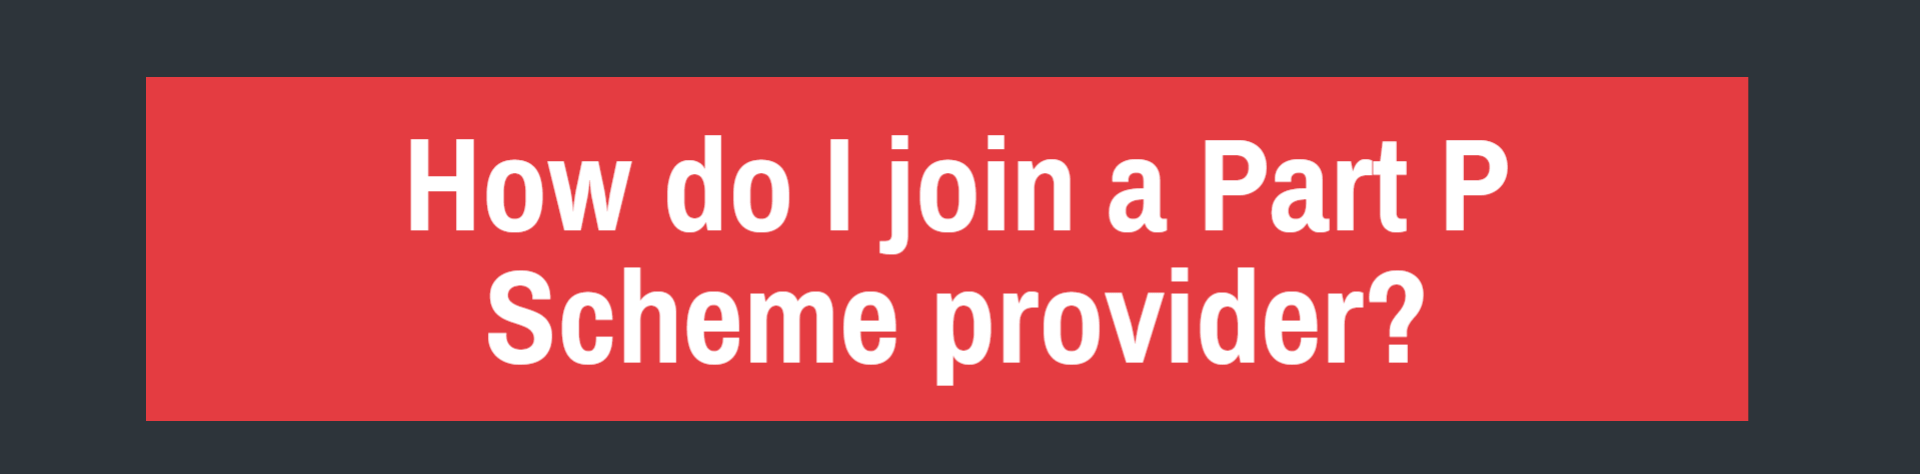 how do i join a part p scheme provider - header